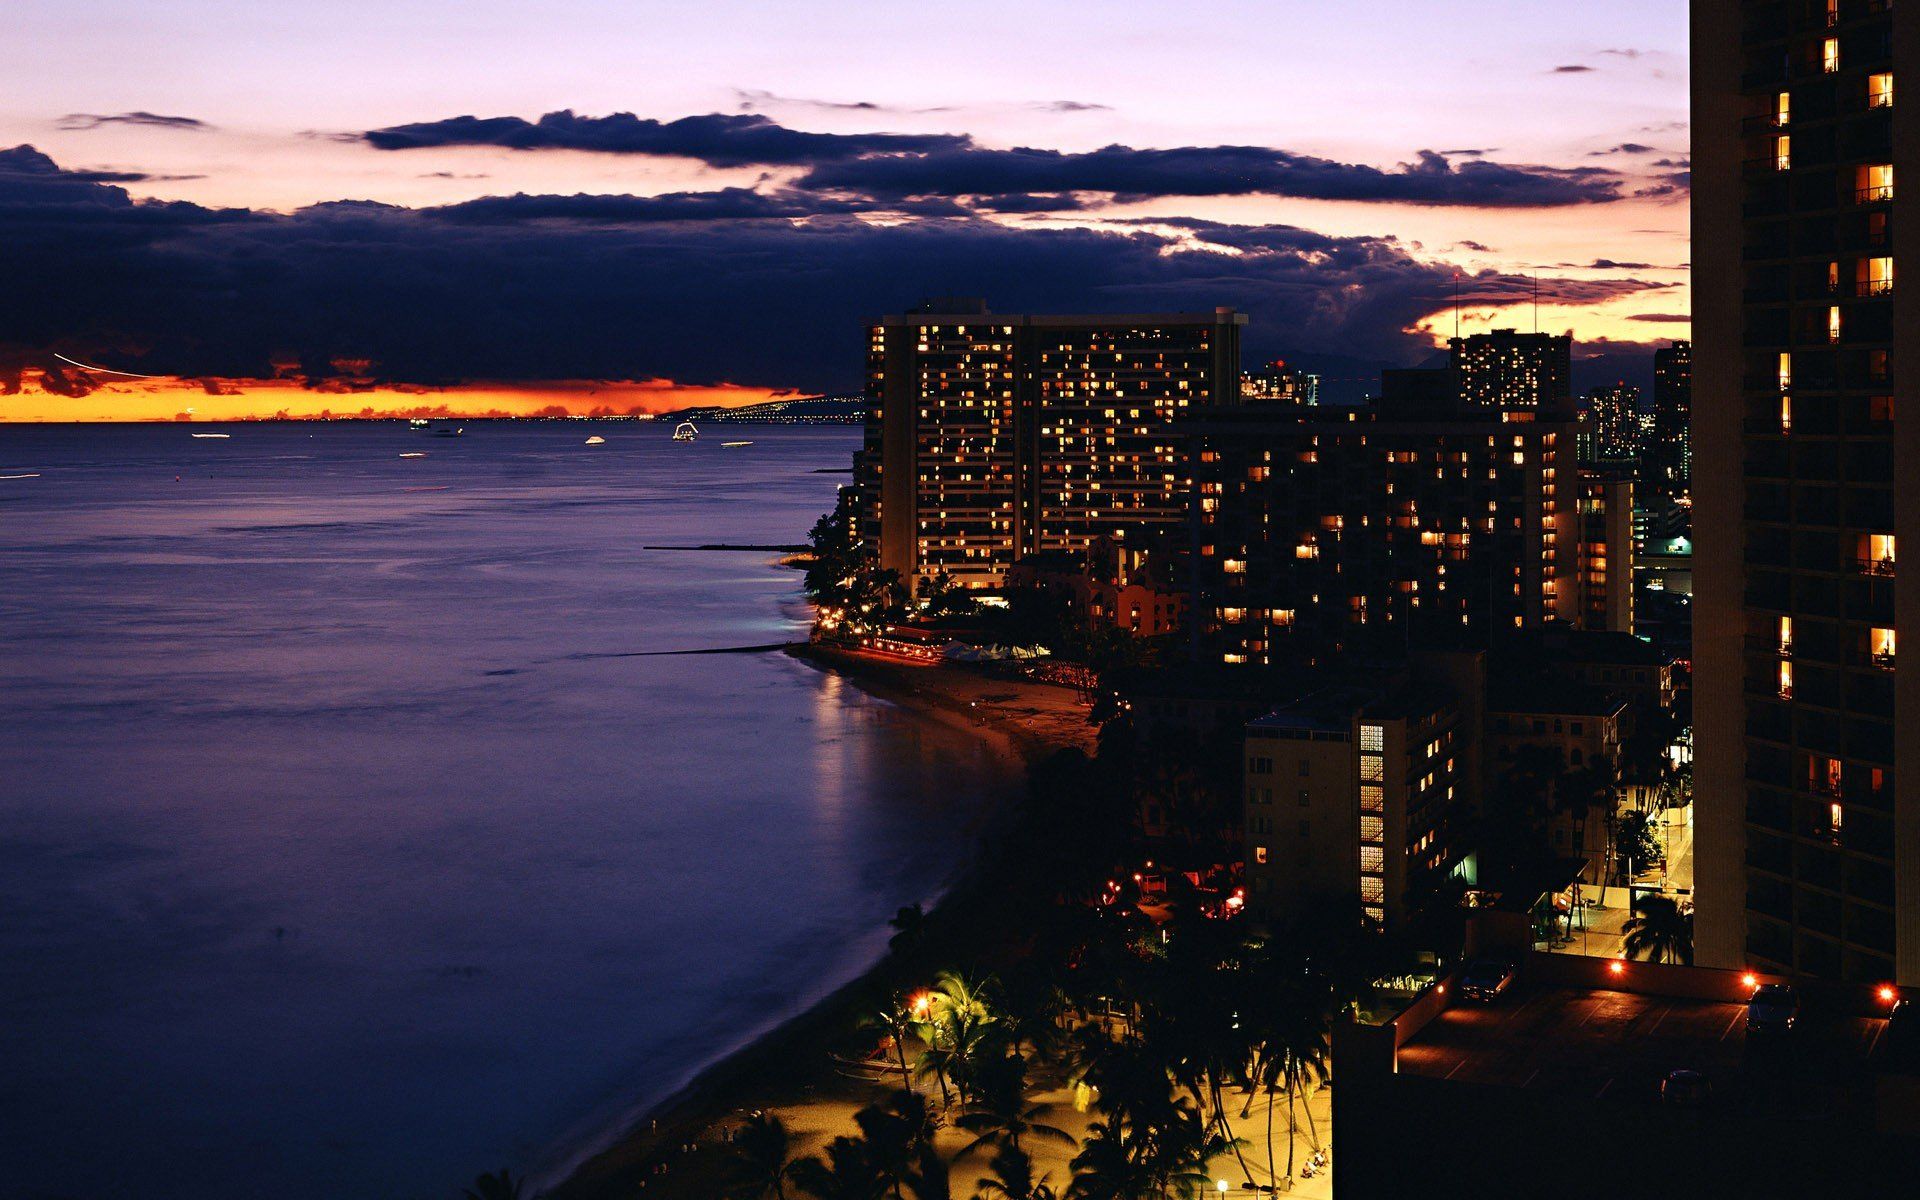 огни город море сумерки lights the city sea twilight  № 2659554 без смс